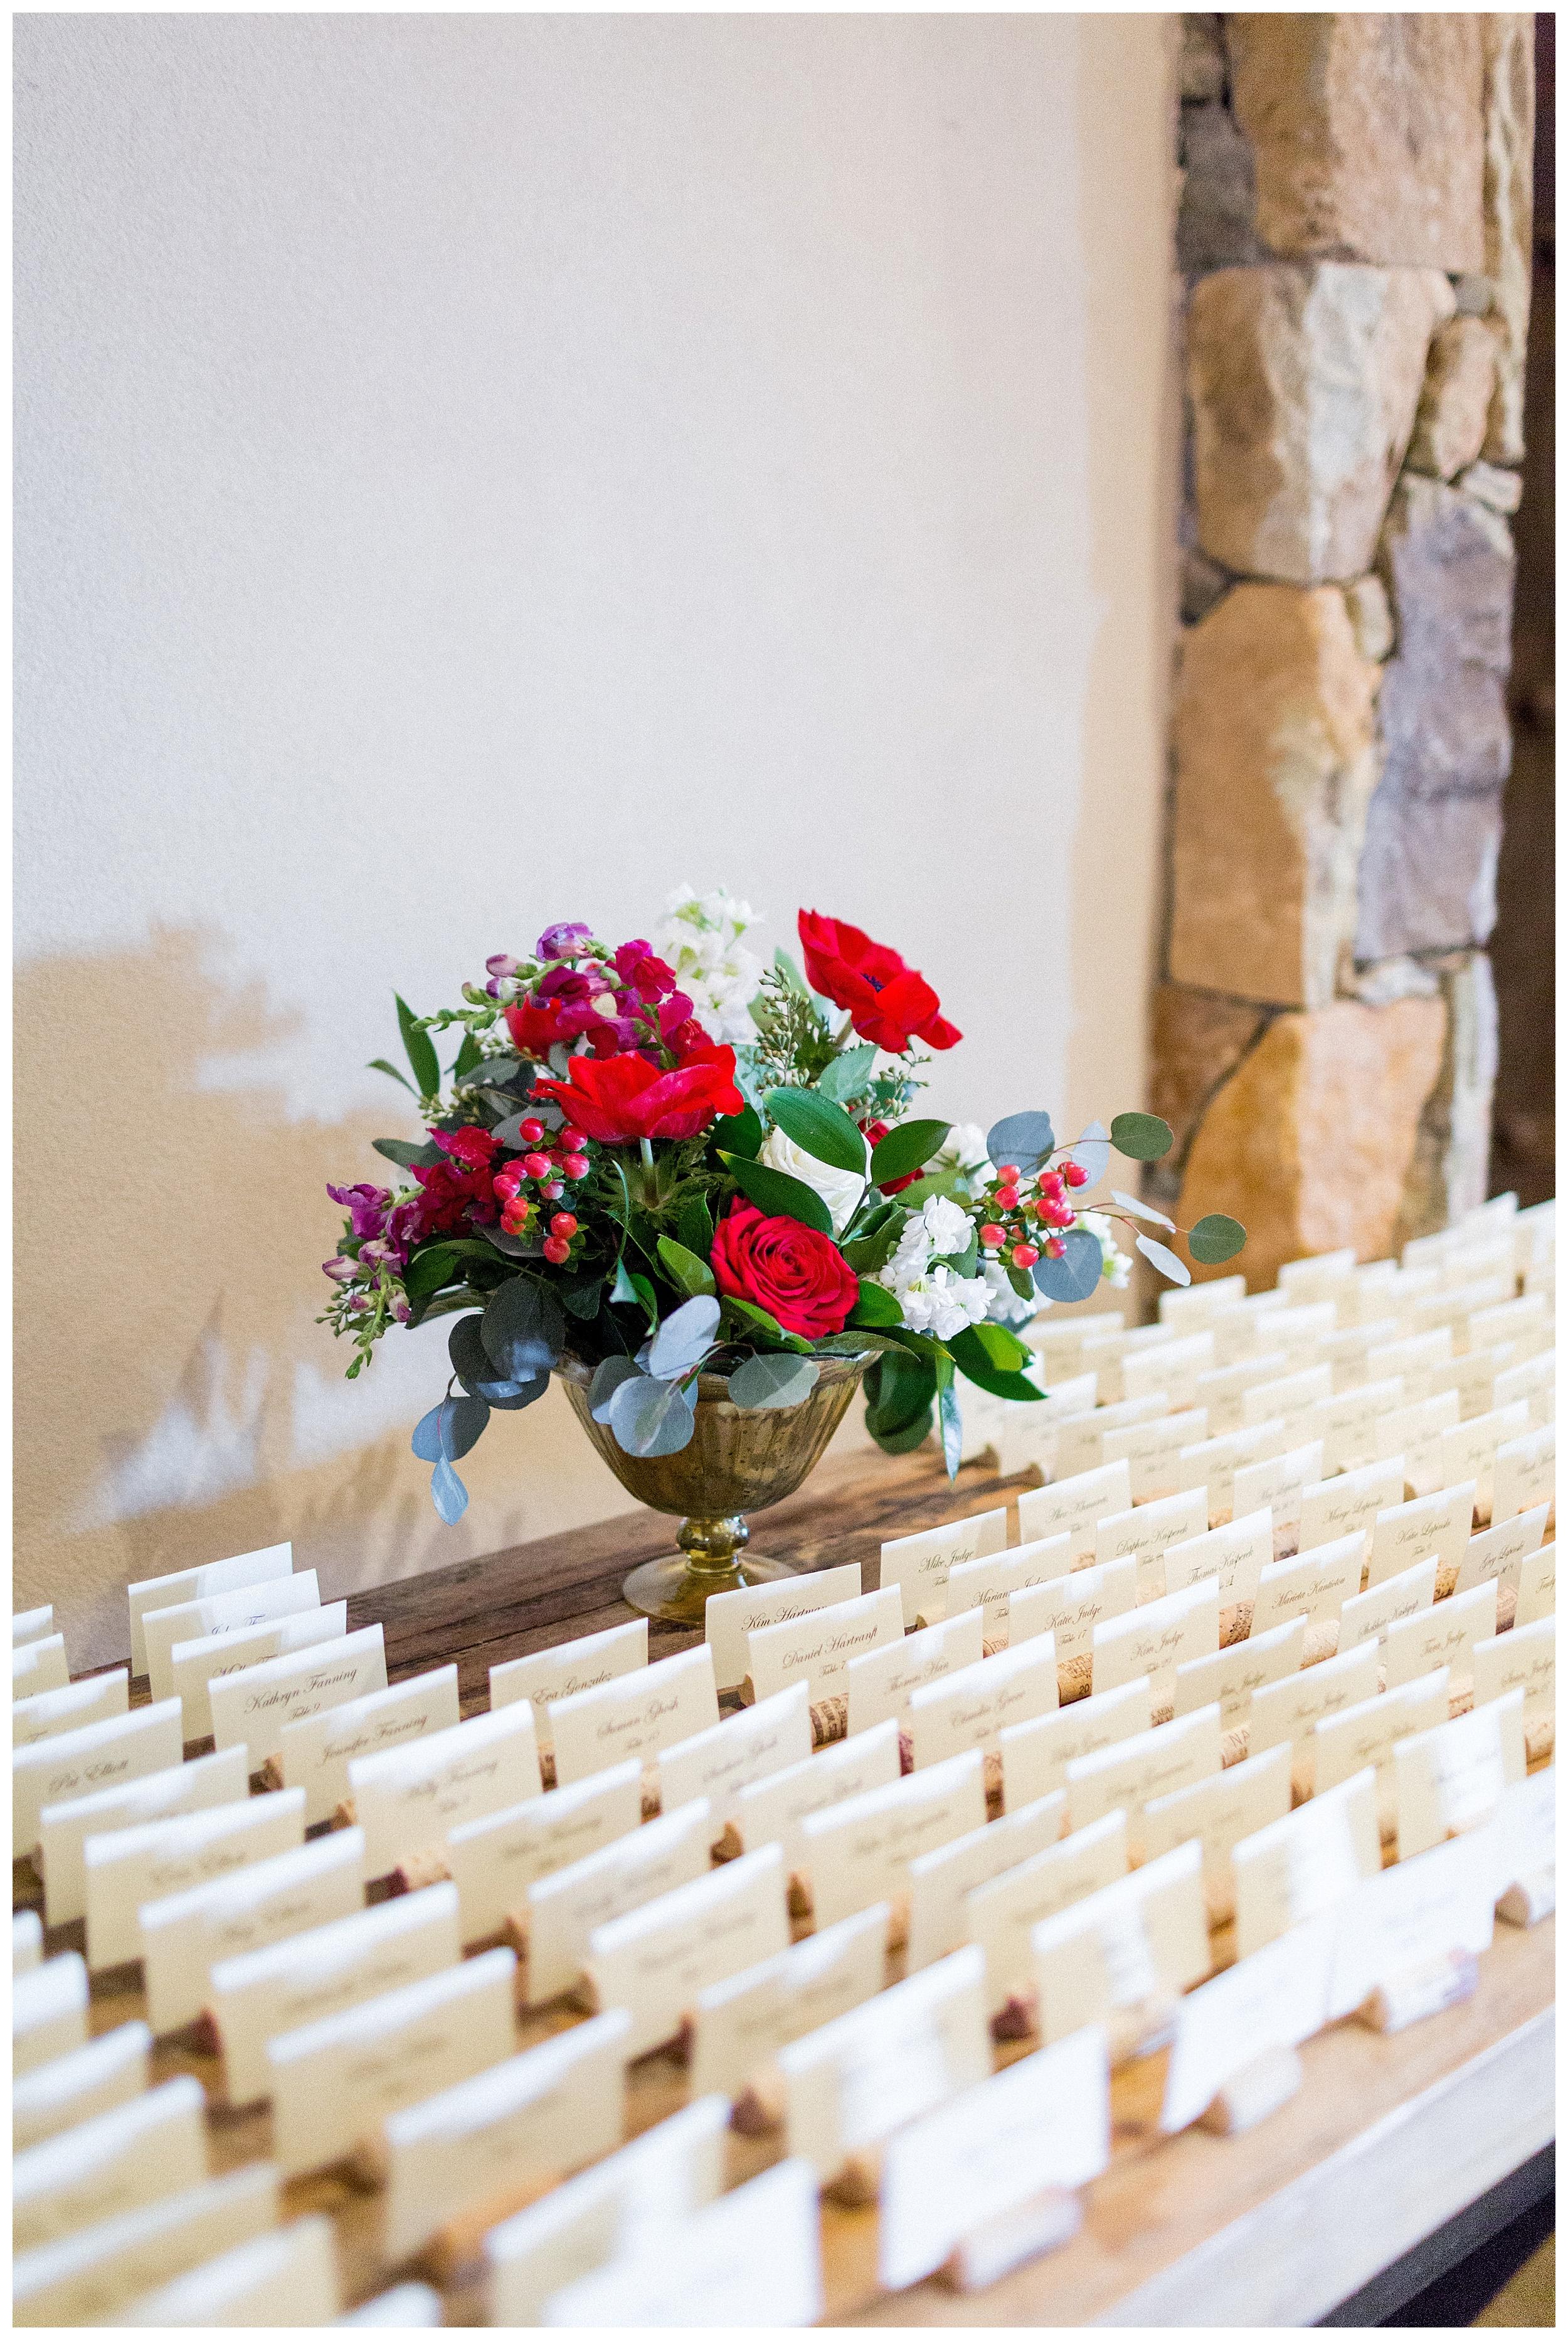 Stone Tower Winery Wedding | Virginia Winter Wedding | VA Wedding Photographer Kir Tuben_0086.jpg